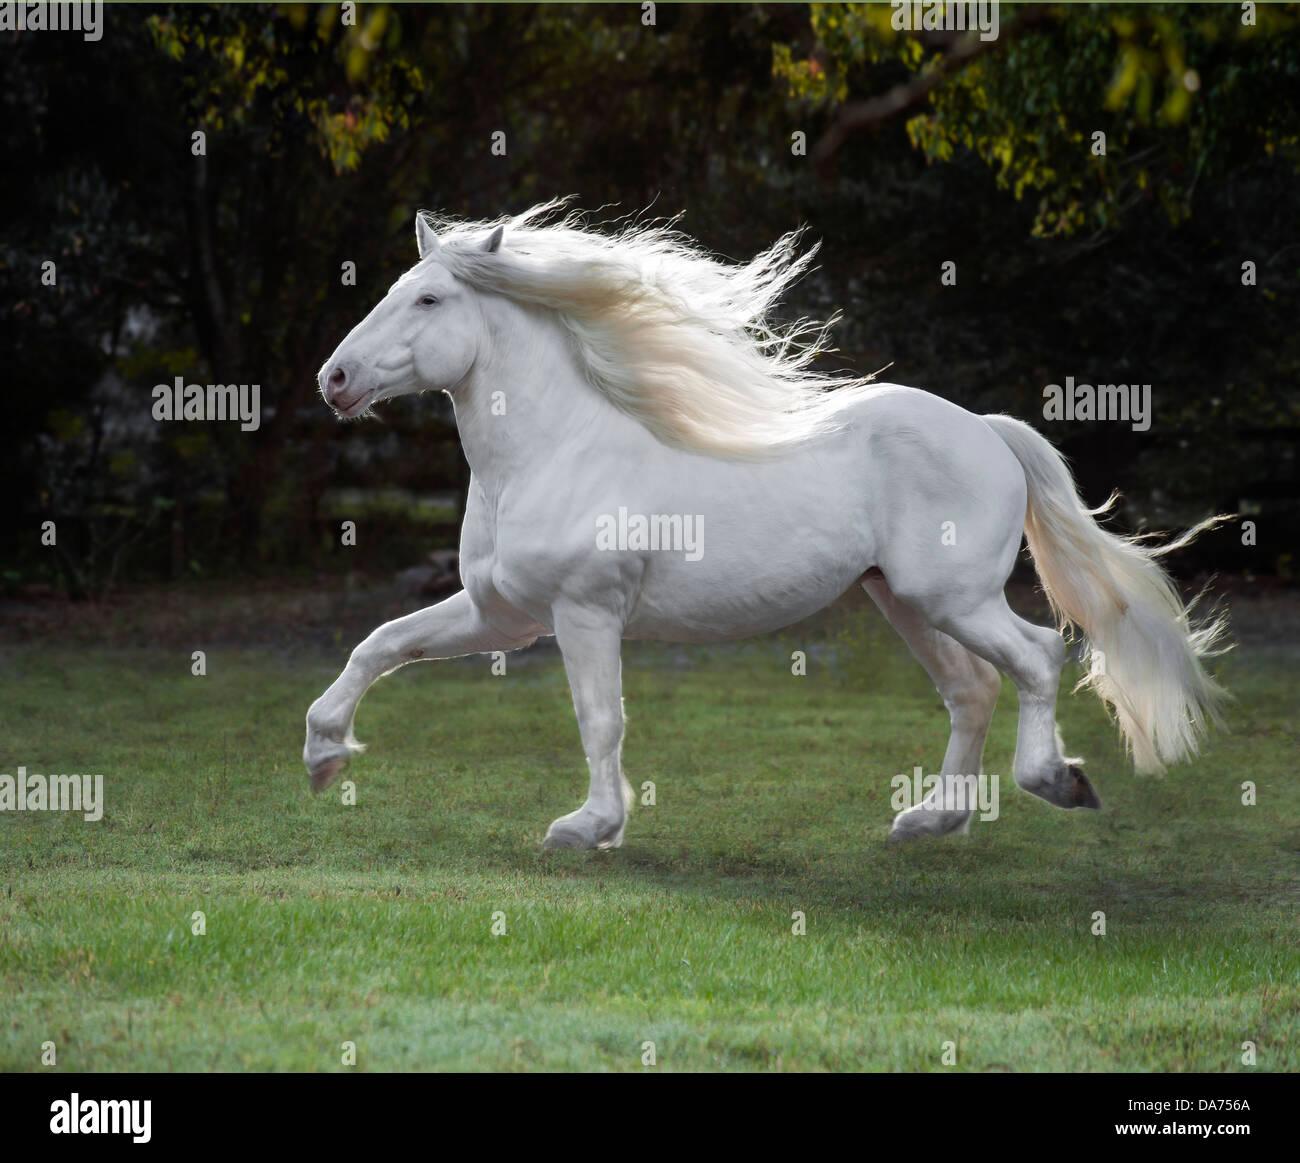 American White Draft Horse Stallion Stock Photo Alamy